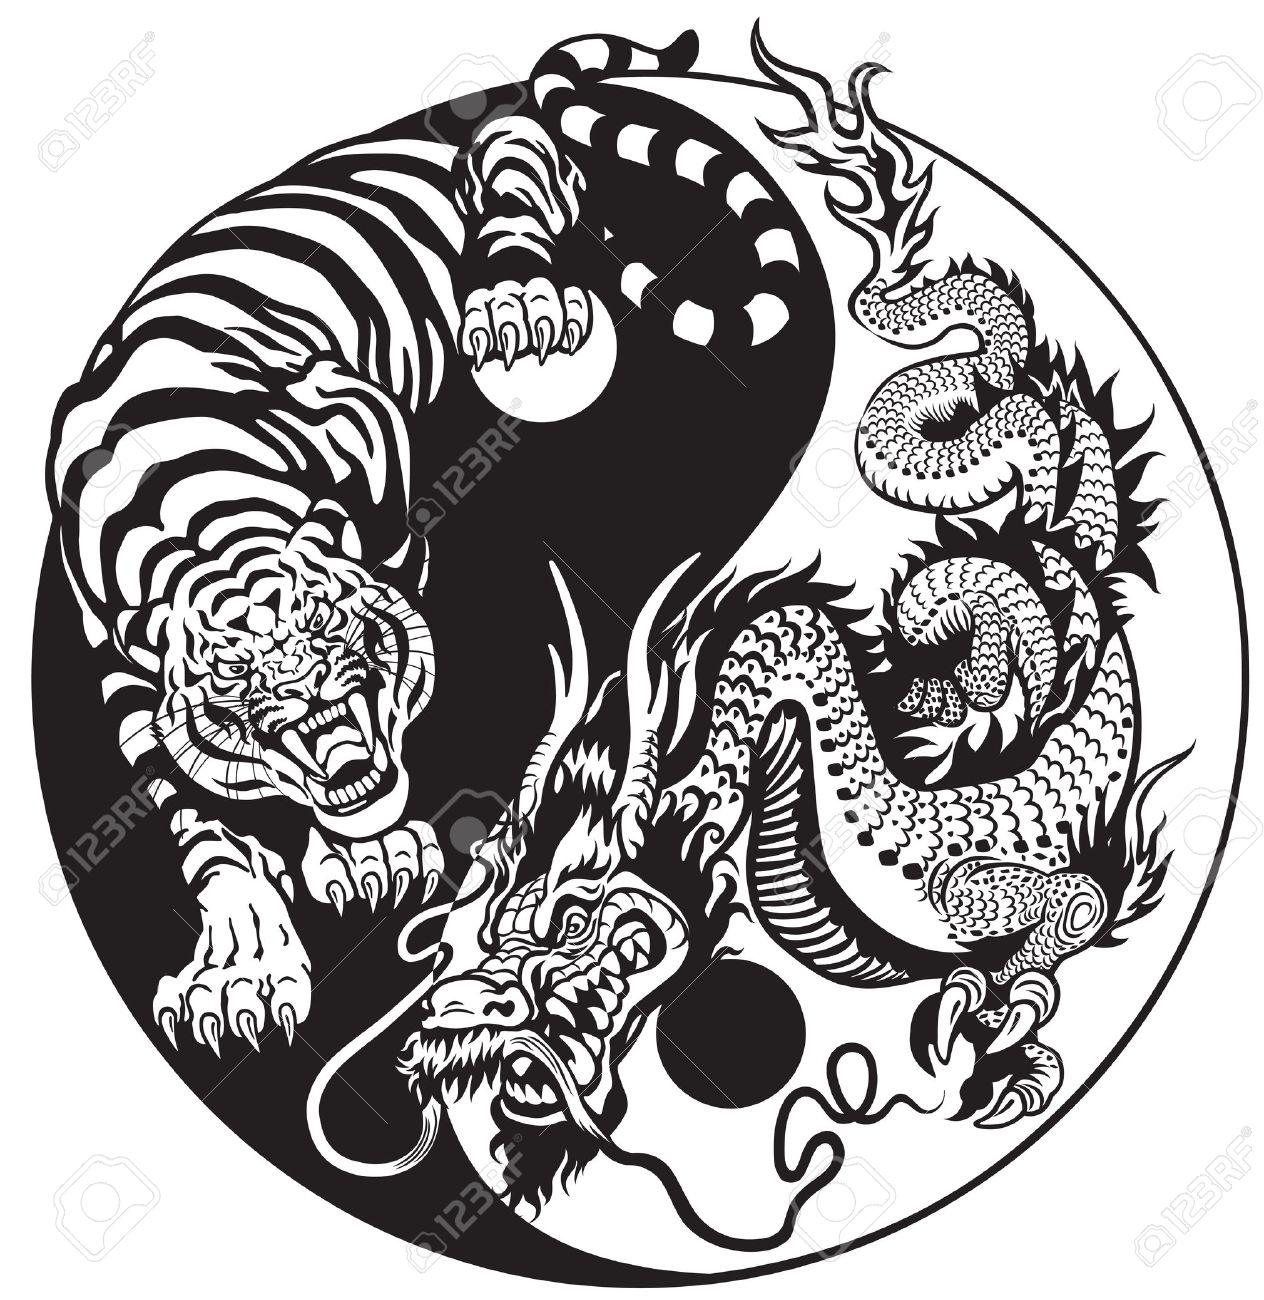 1264x1300 Dragon And Tiger Yin Yang Symbol Of Harmony And Balance. Black